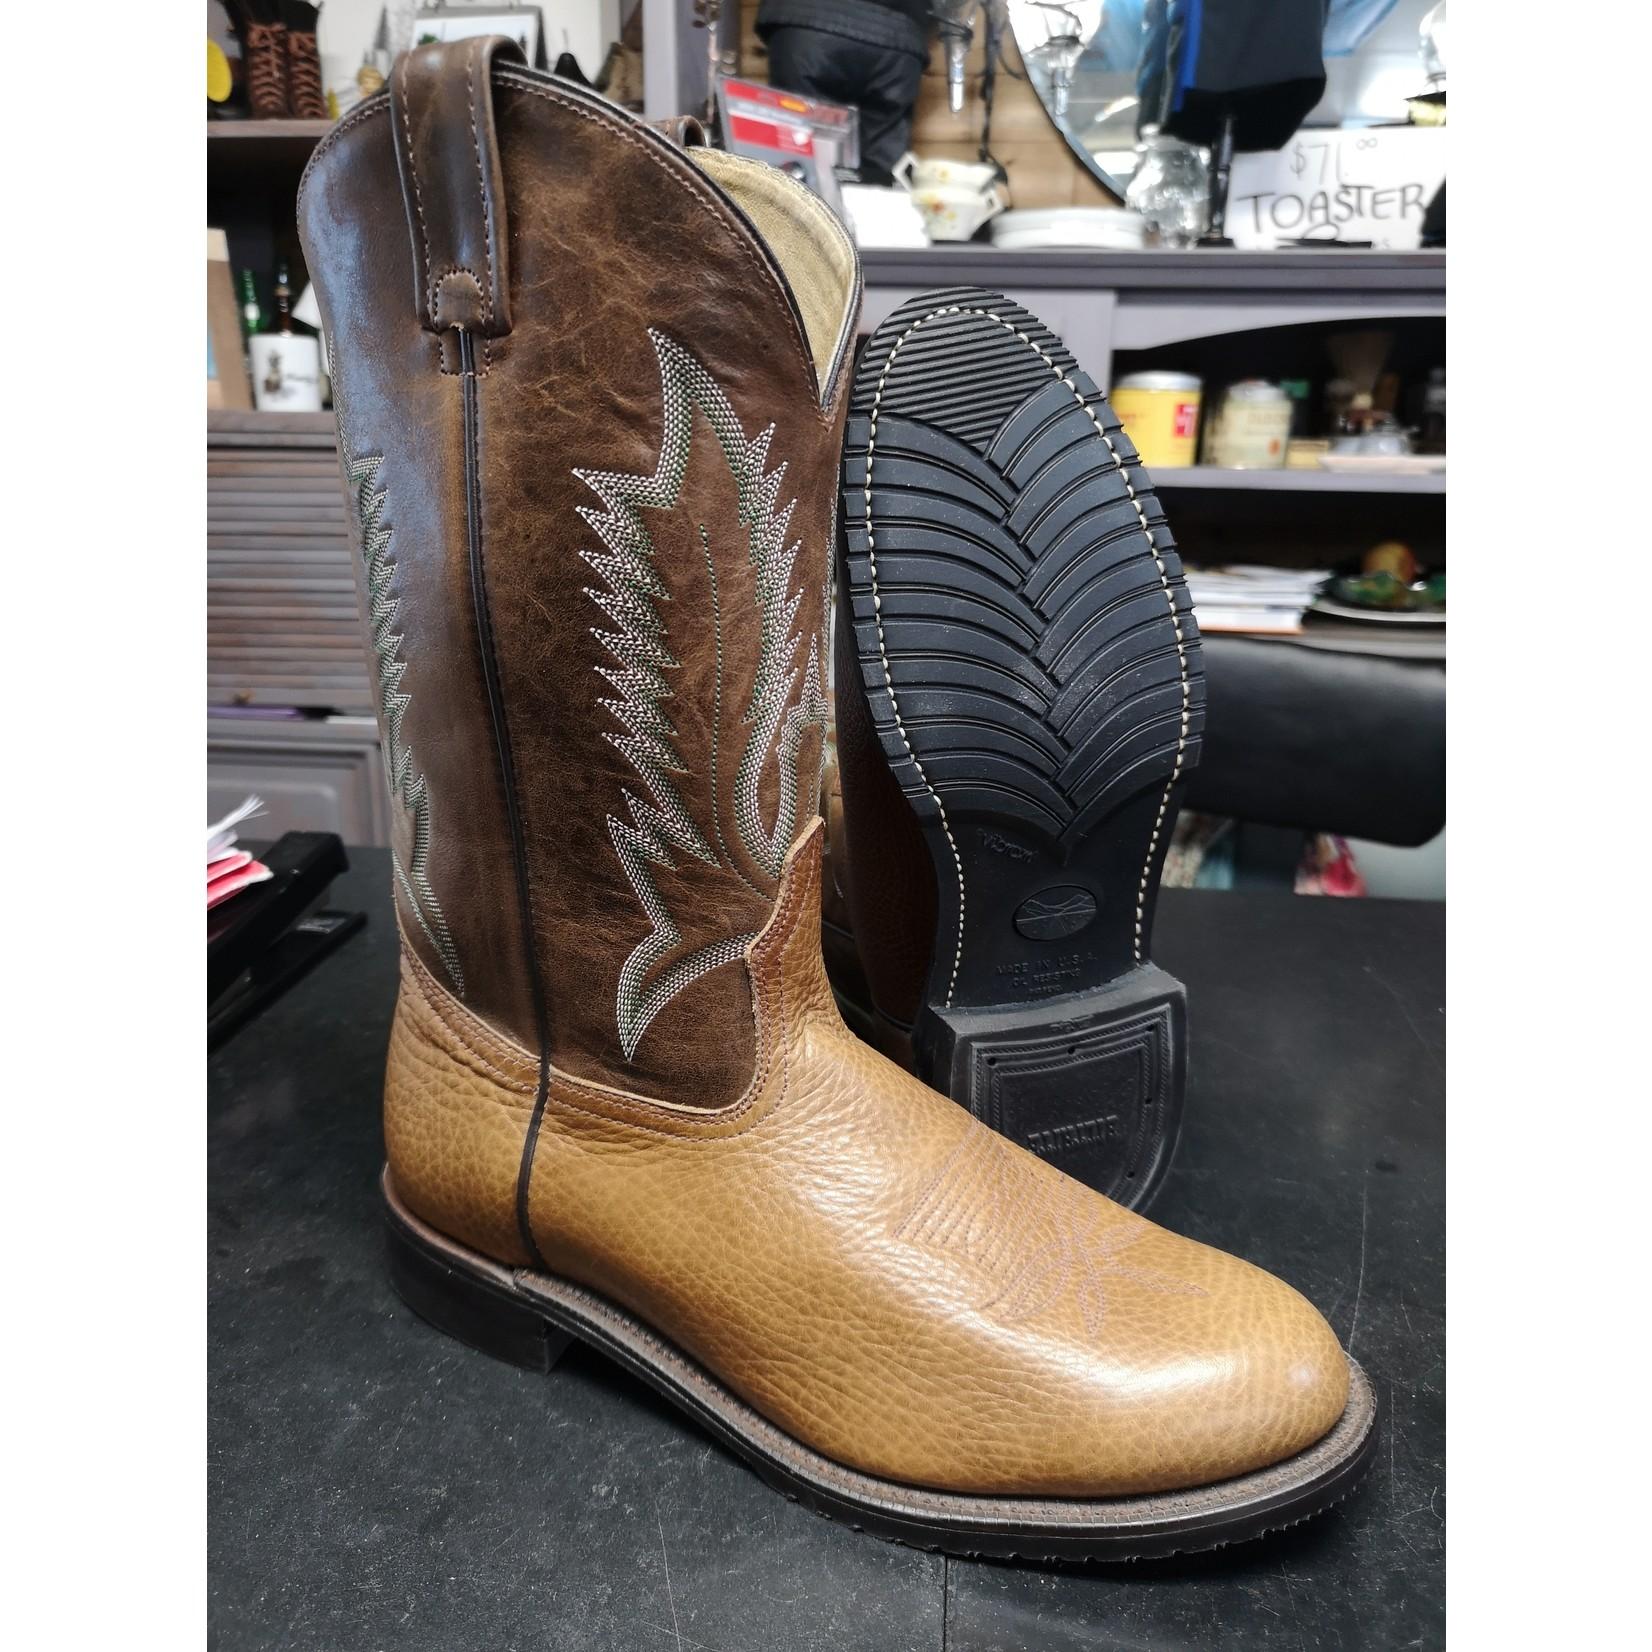 Canada West Canada West Men's Cowboy Boot - 8500 - SIZE 9 (3E)